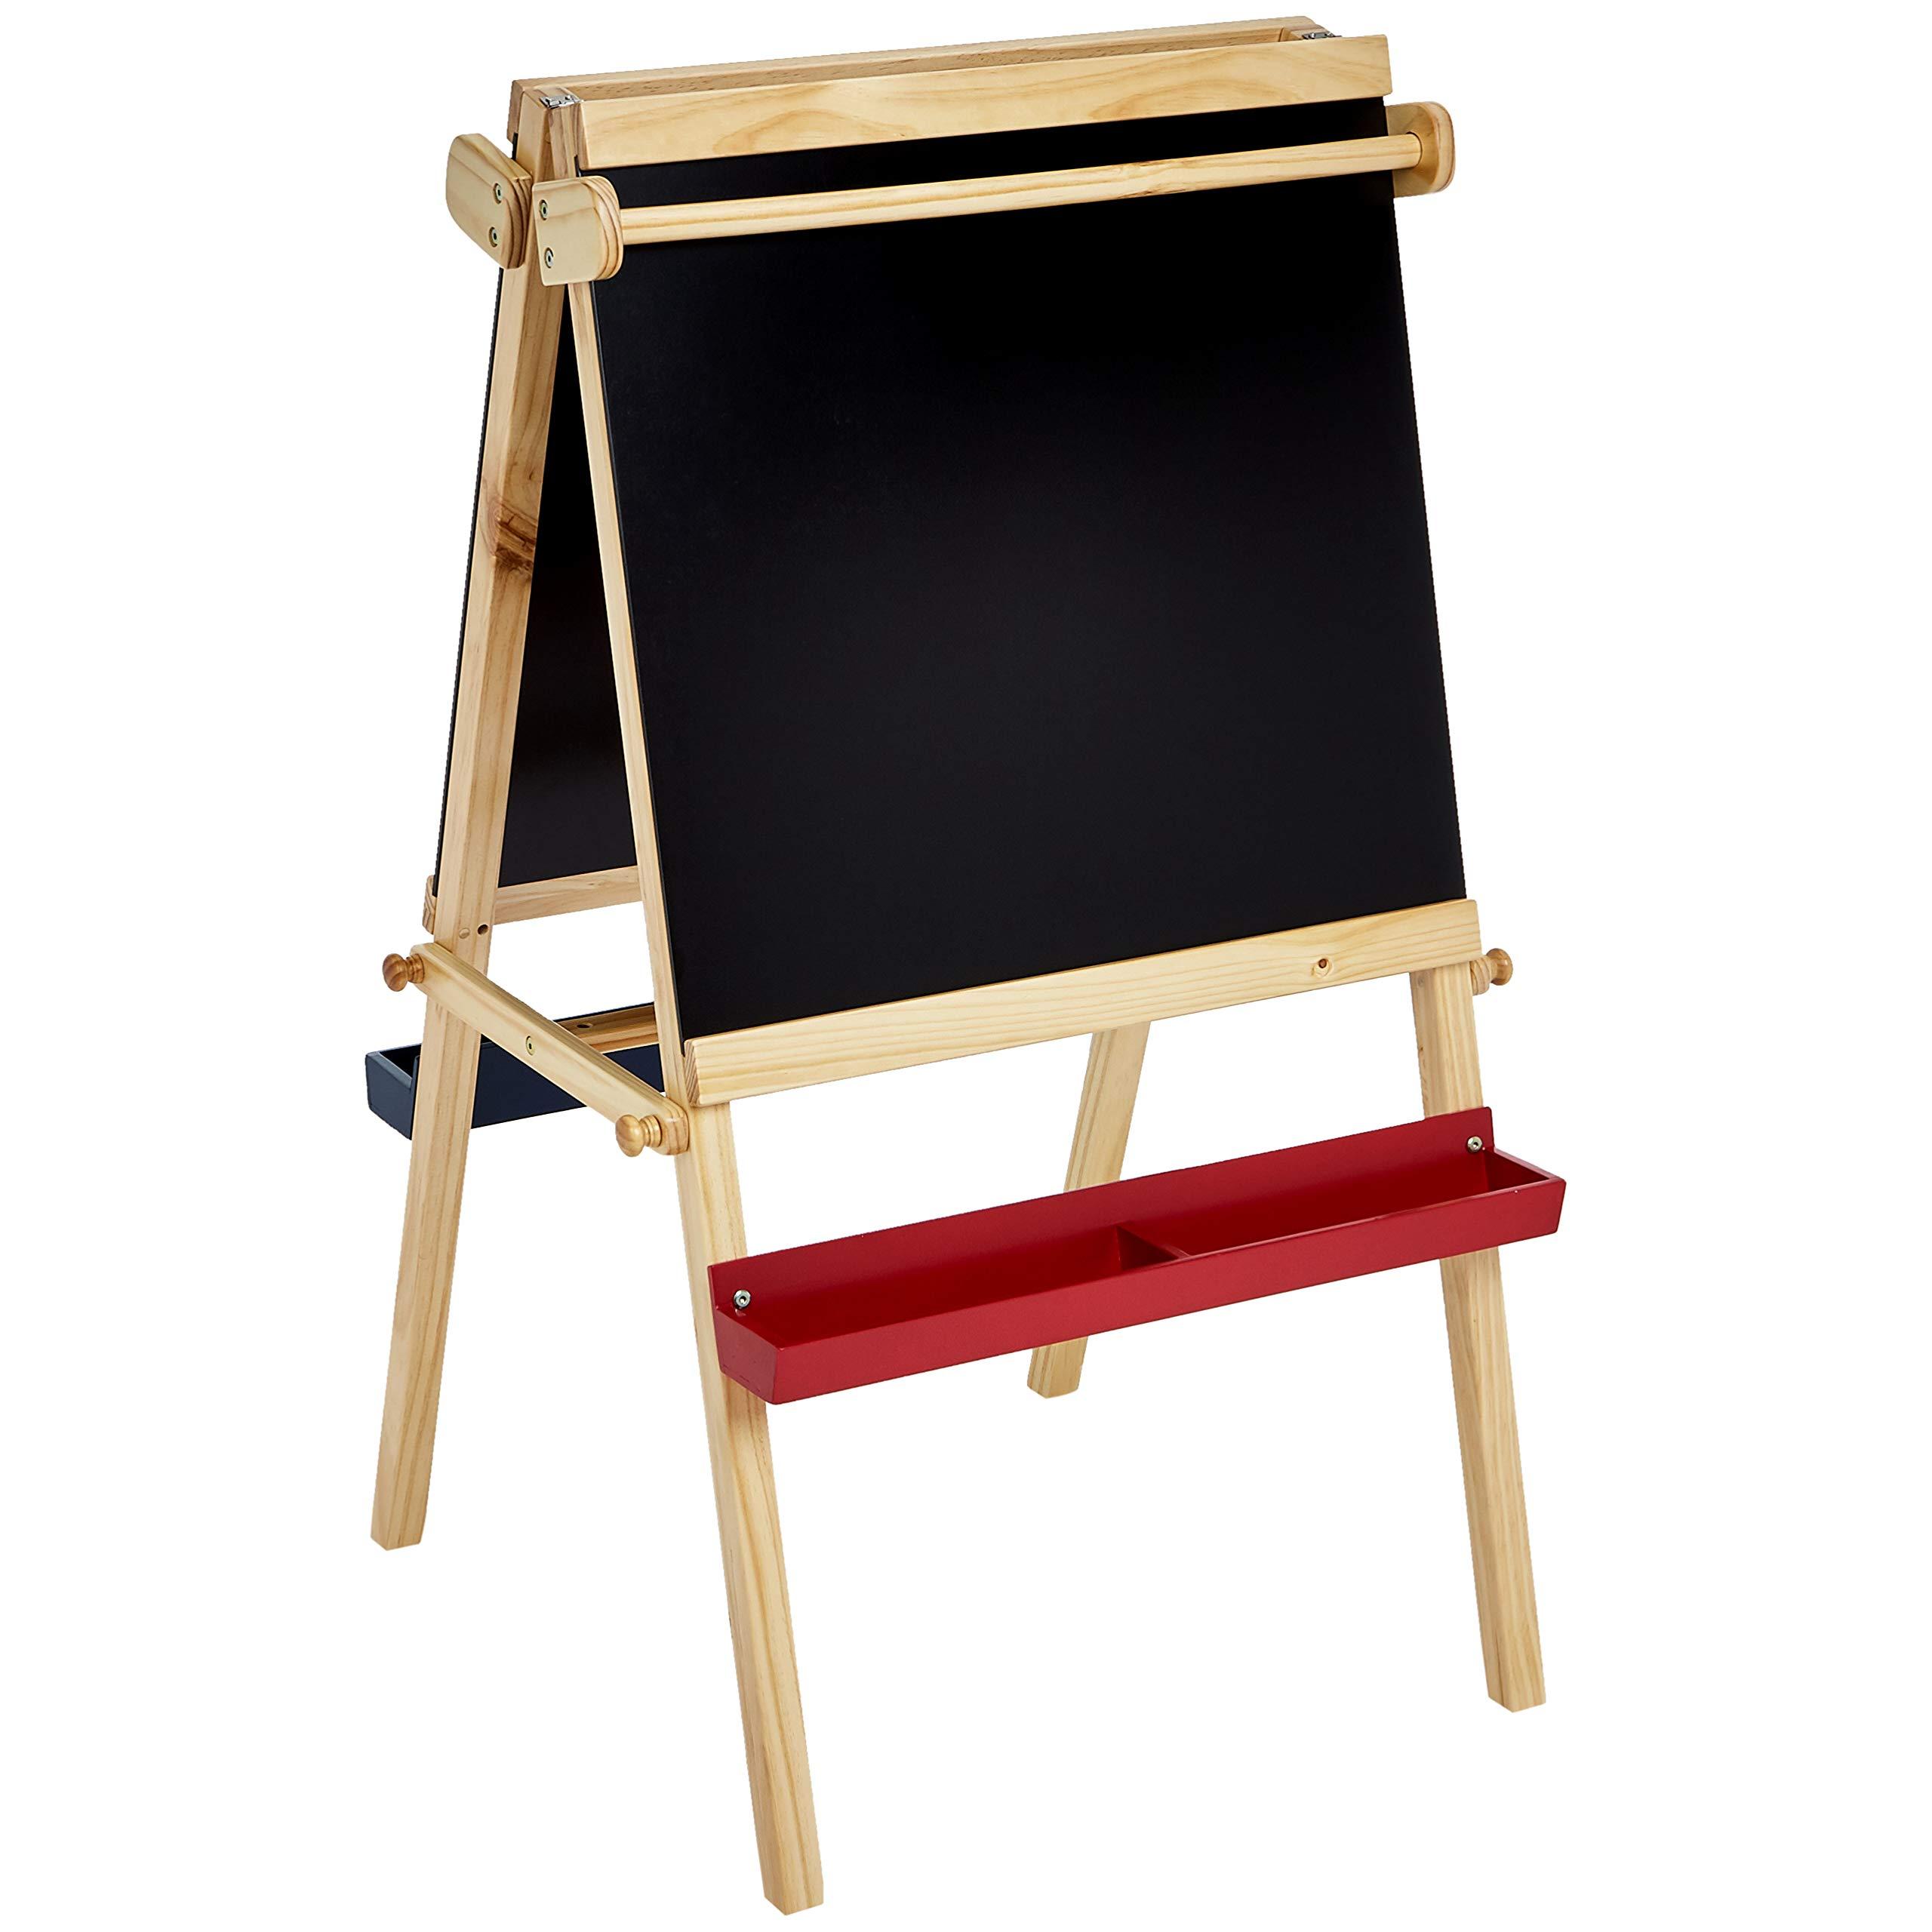 AmazonBasics Kids Standing Art Easel, Dry-Erase Board, Chalkboard, 2 Paper Rollers